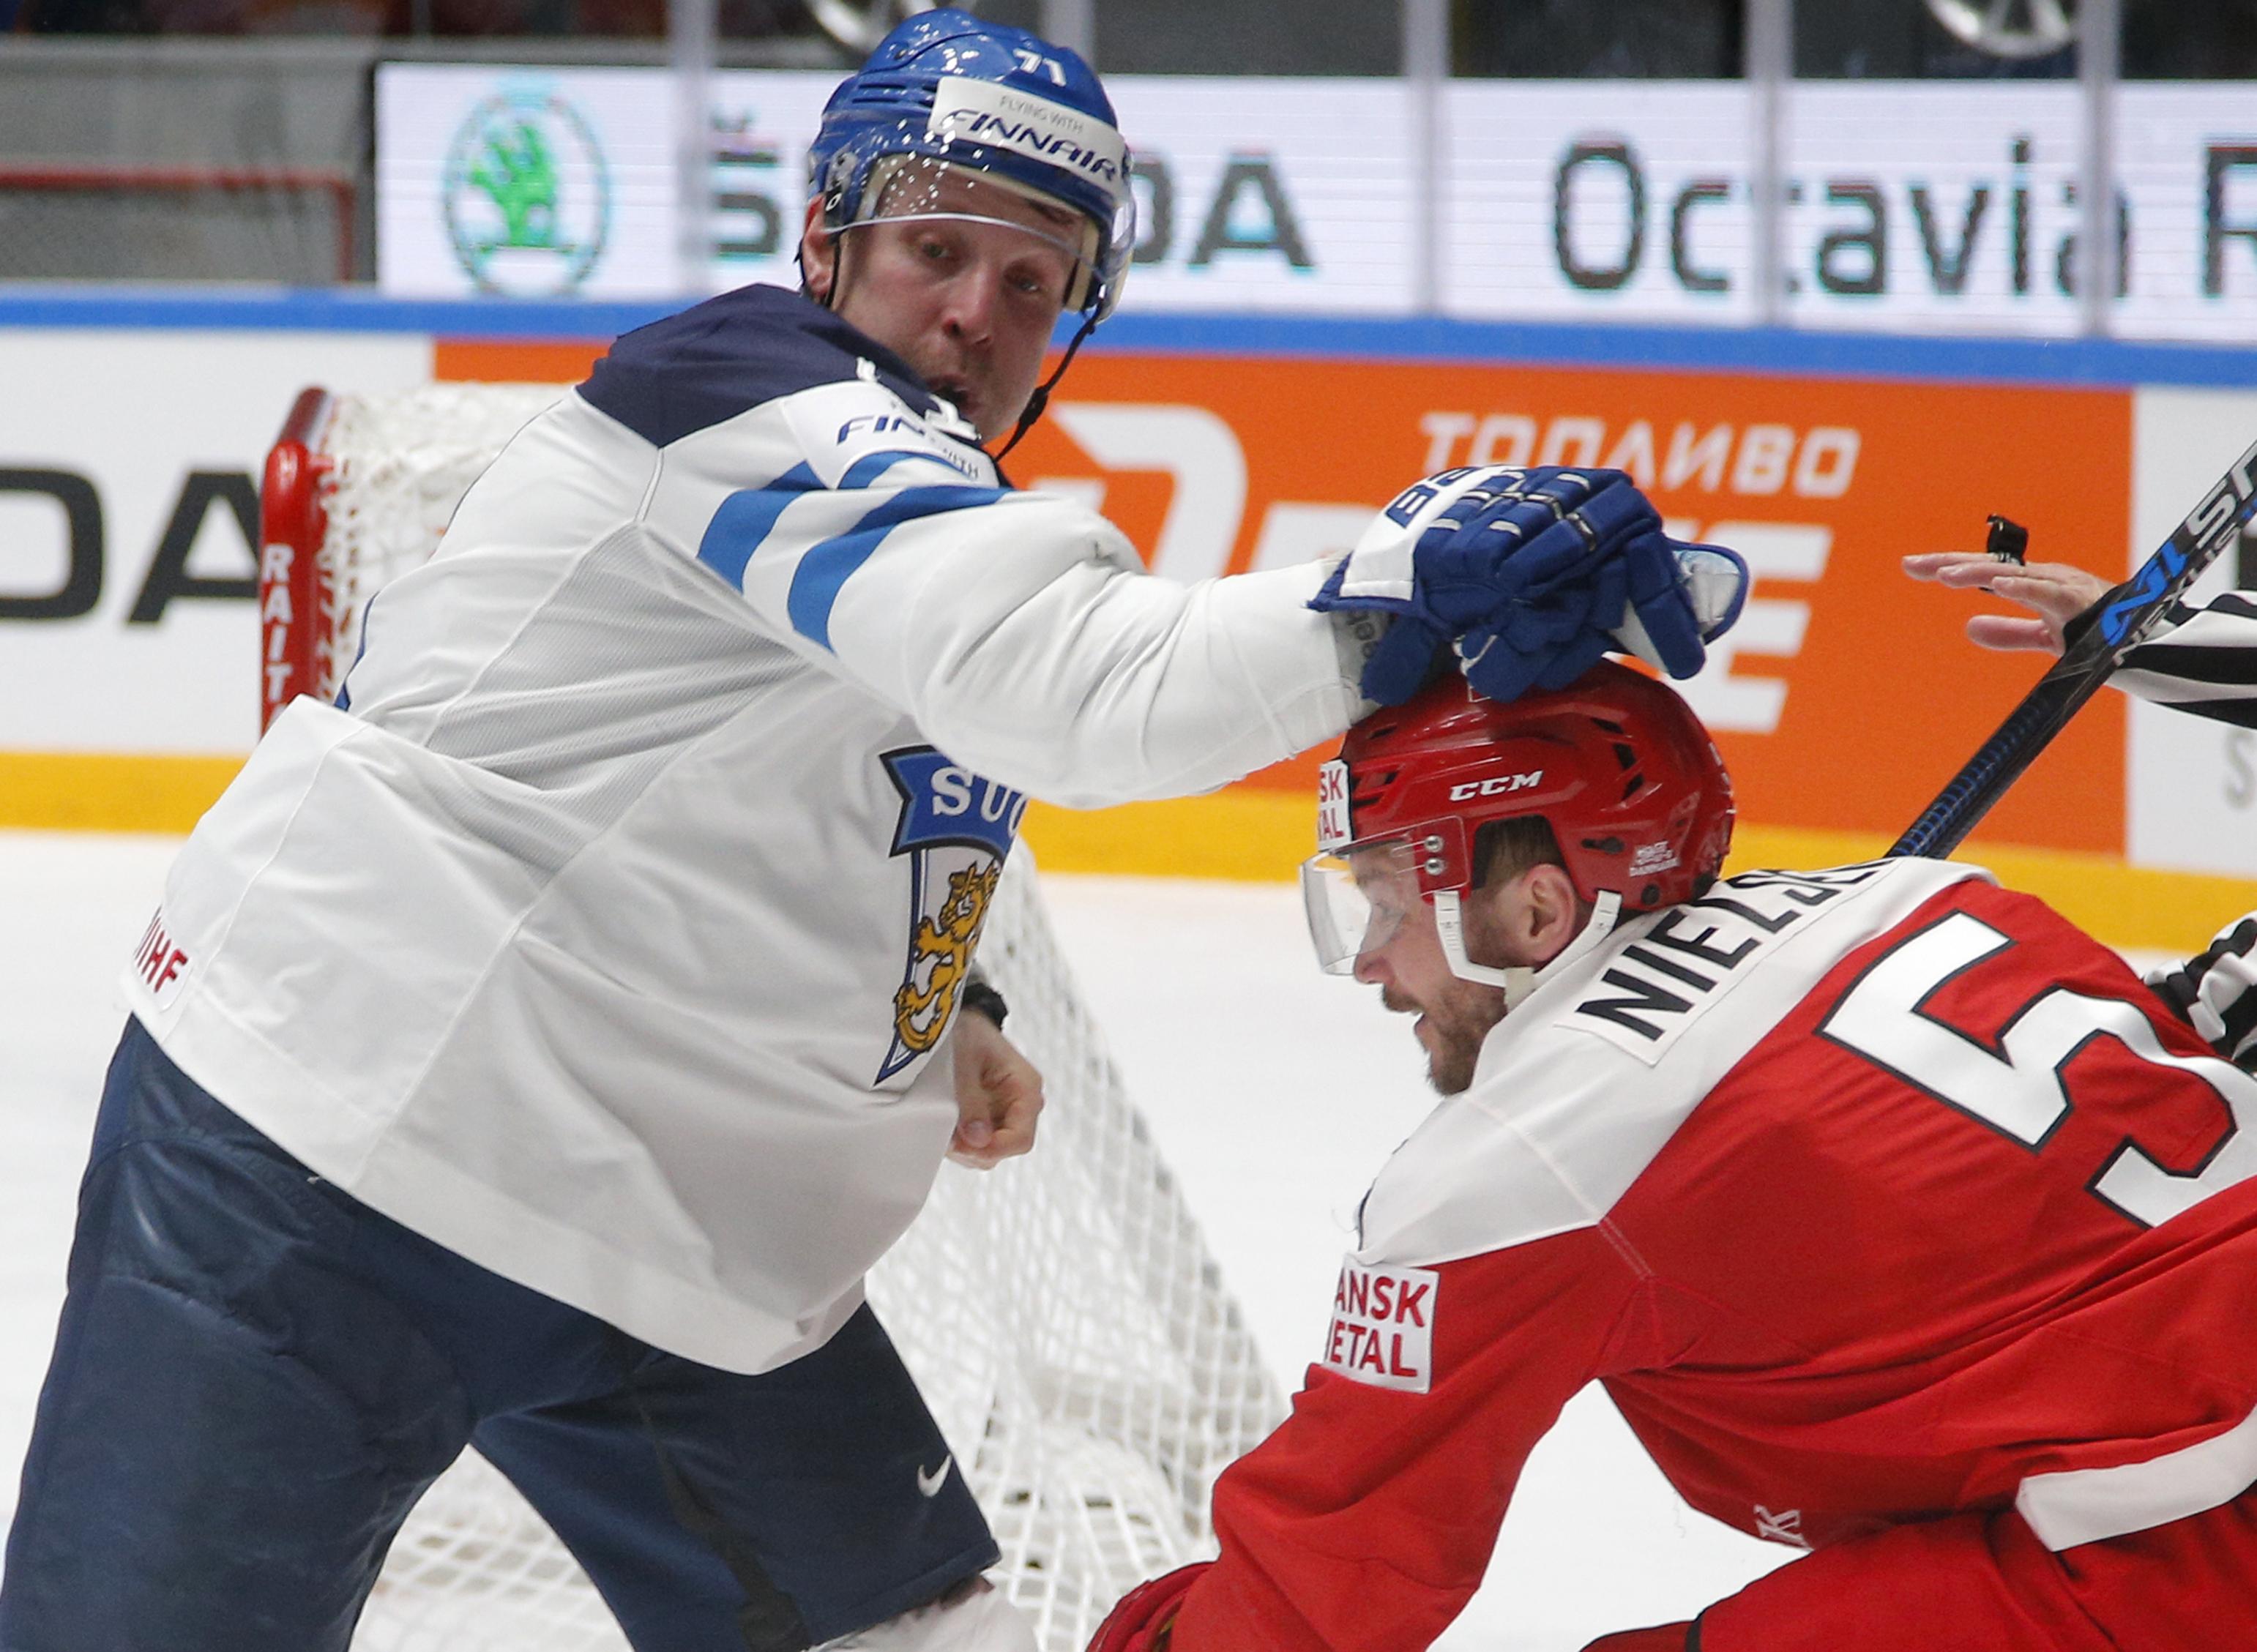 Leo Komarov of Finland, left, challenges Denmarks Daniel Nielsen during the Hockey World Championships quarterfinal match between Finland and Denmark in St.Petersburg, Russia, Thursday, May 19, 2016. (AP Photo/Dmitri Lovetsky)